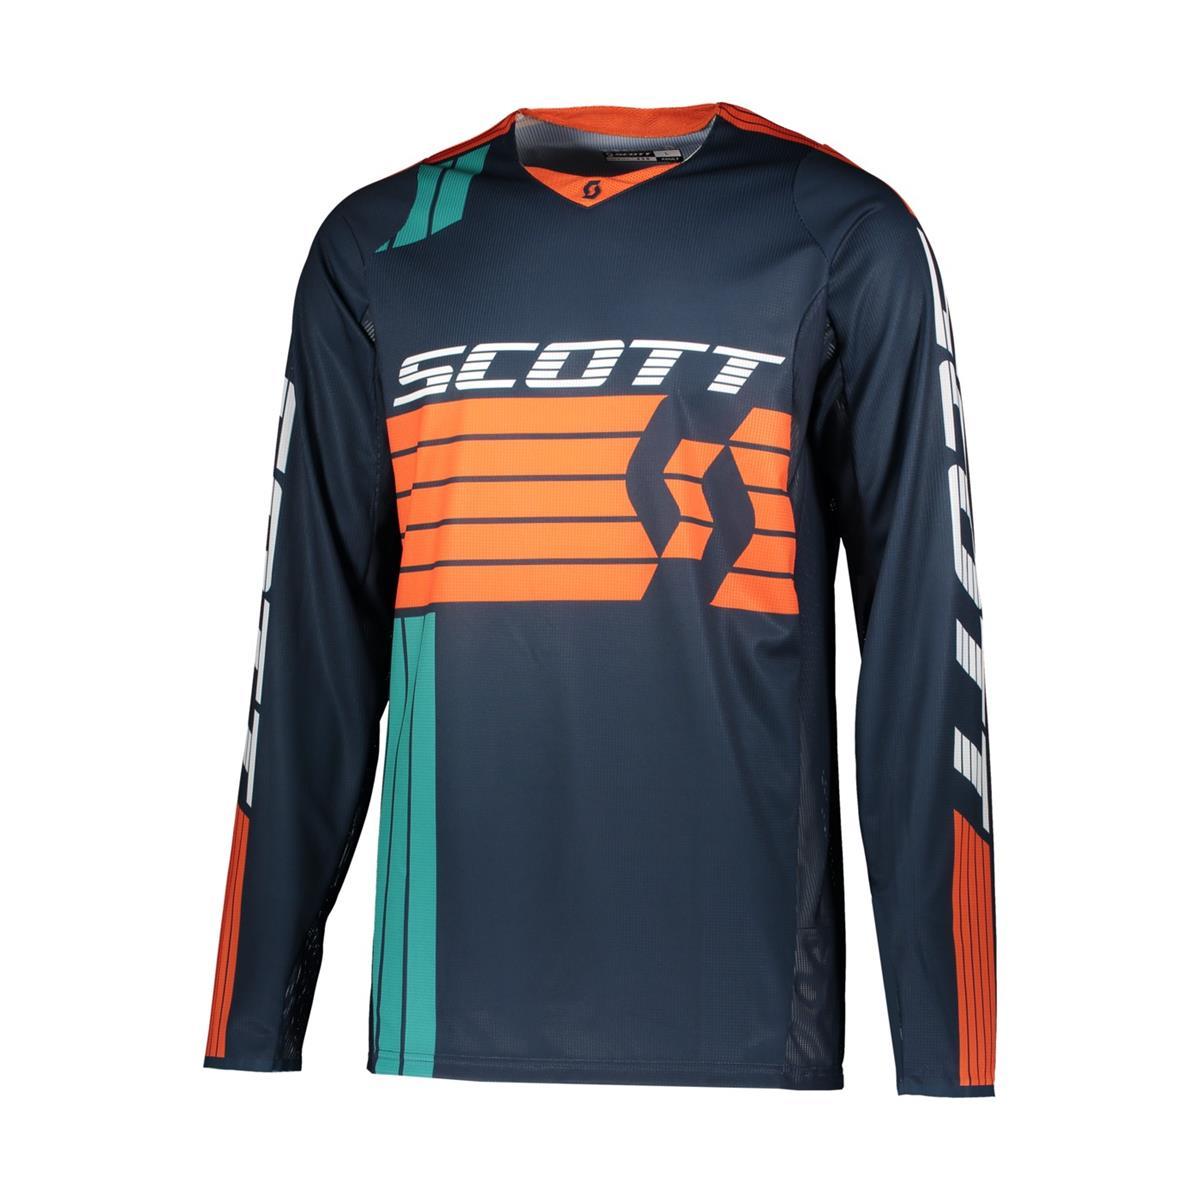 Scott Jersey 450 Podium Blau/Orange